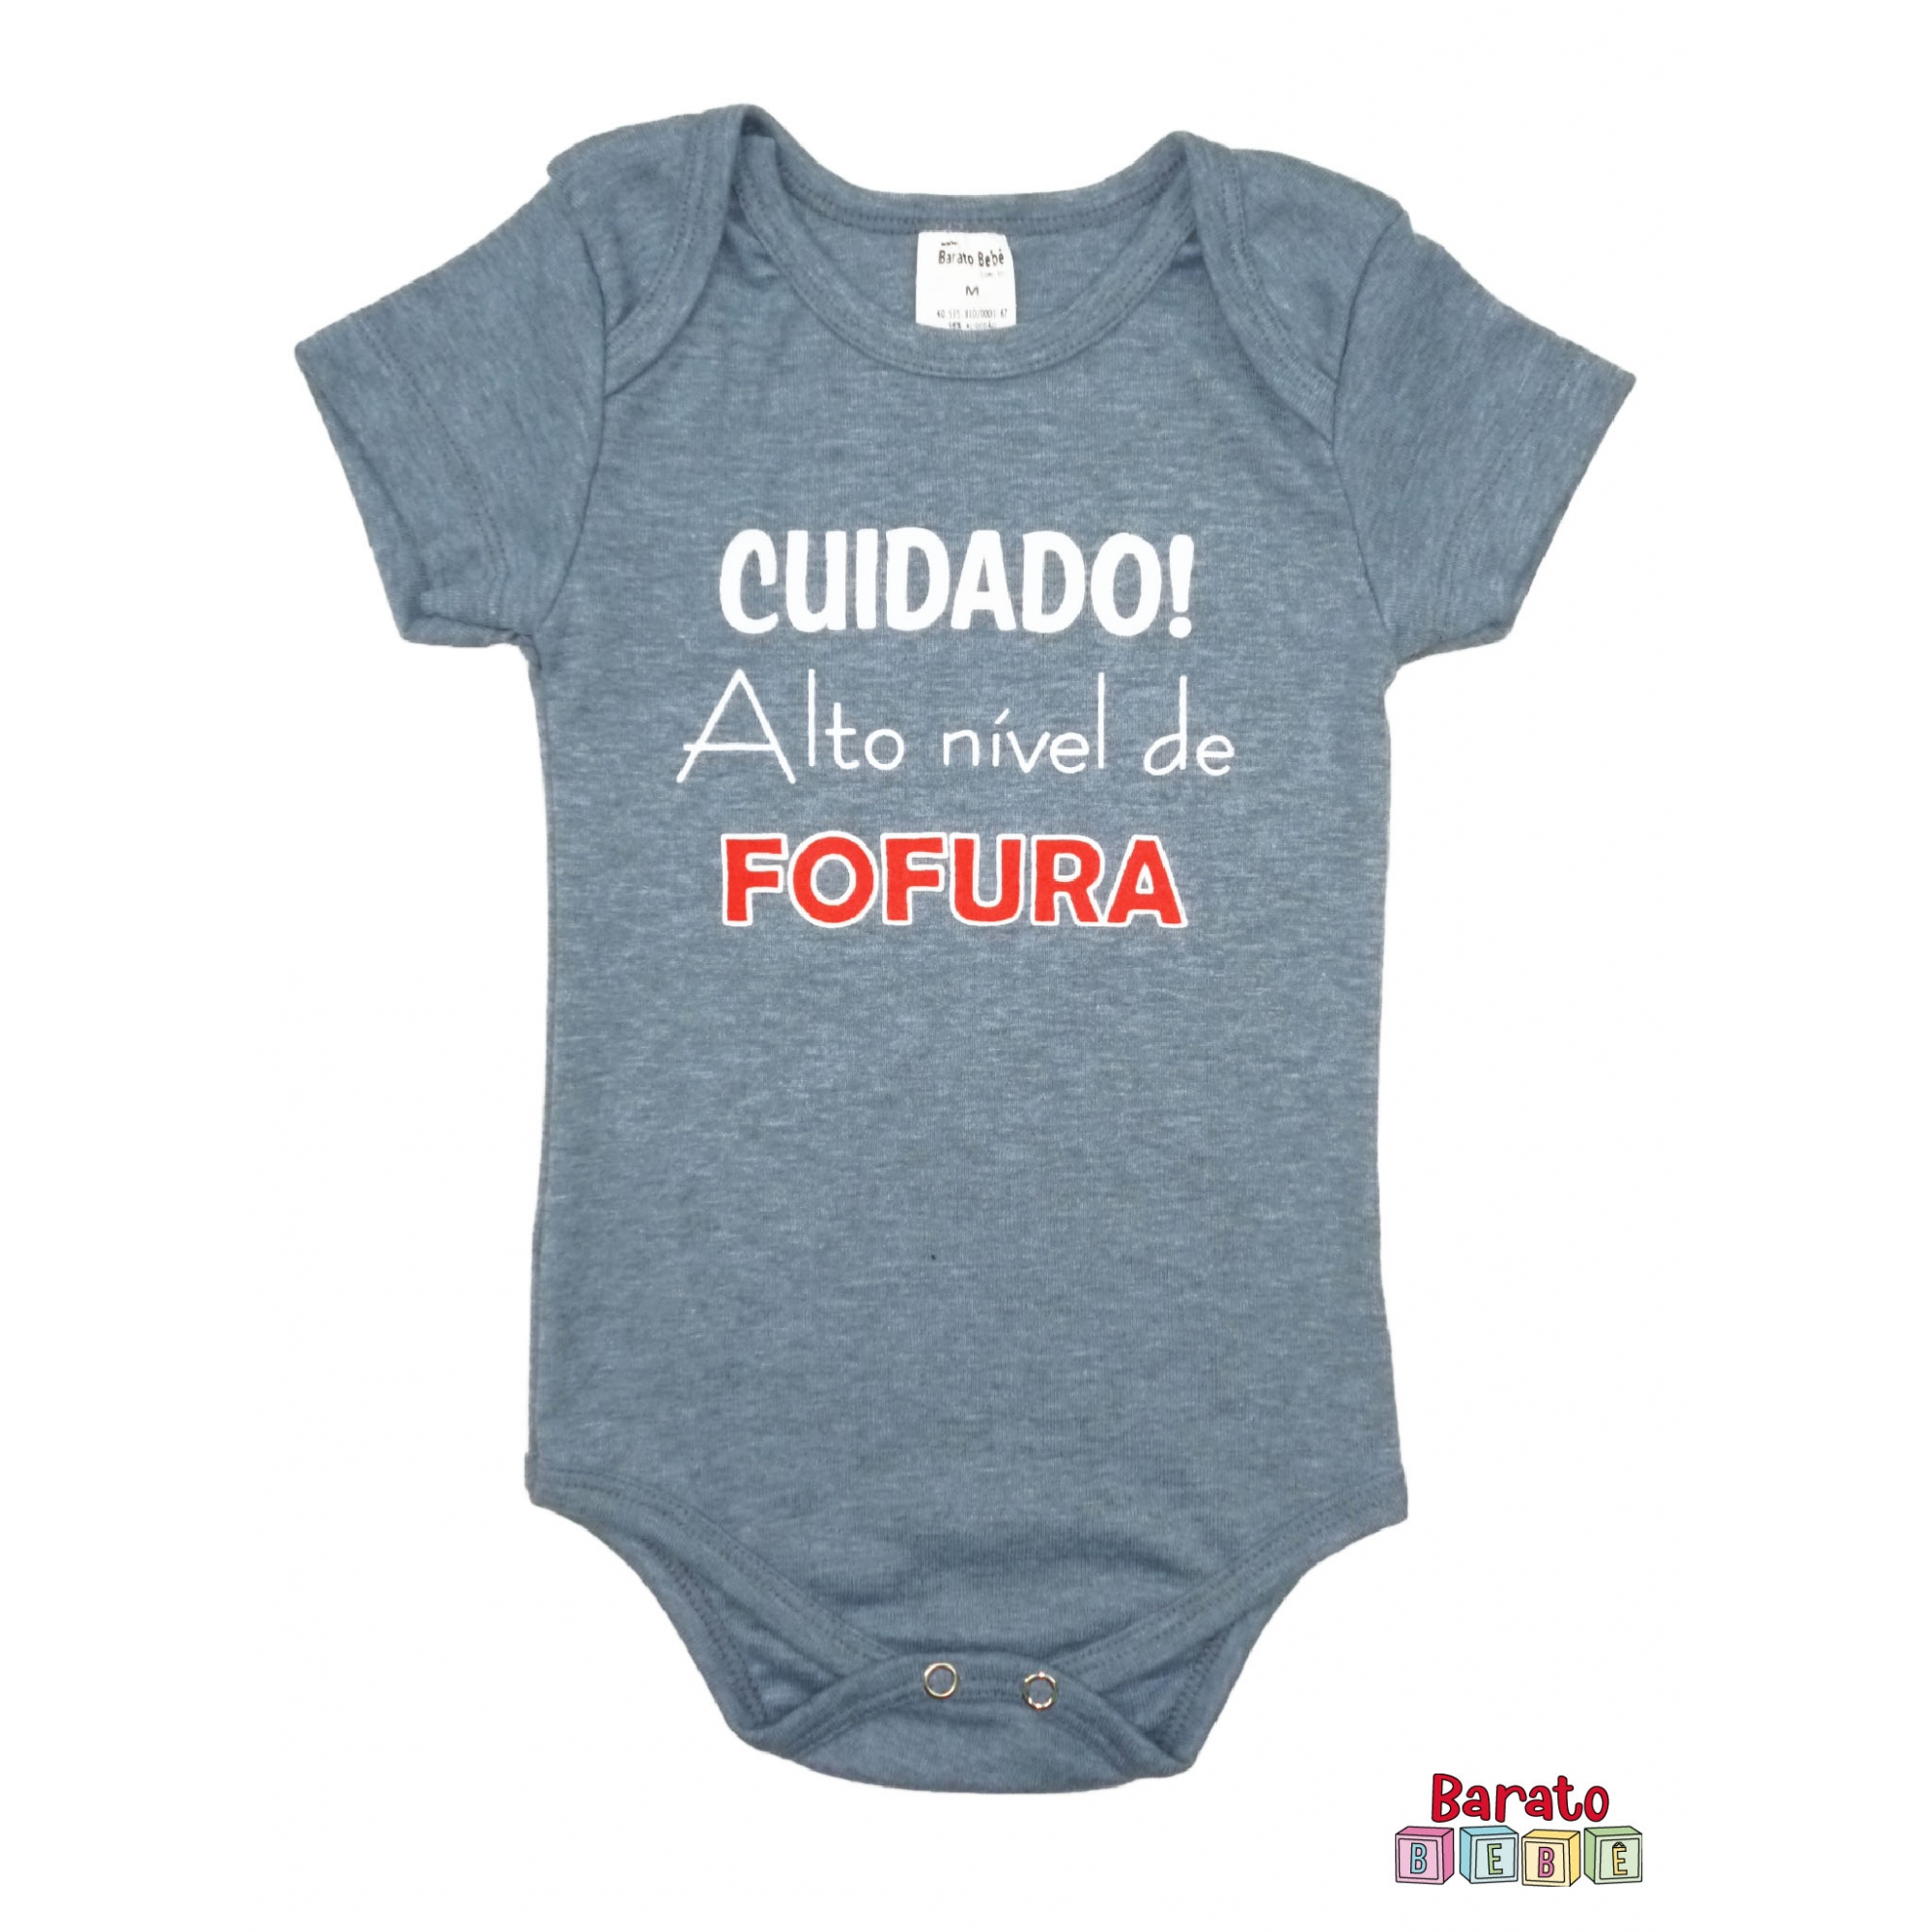 Body Bebê MC (P/M/G) - Cuidado! Alto Nível de Fofura - Barato Bebê - Azul